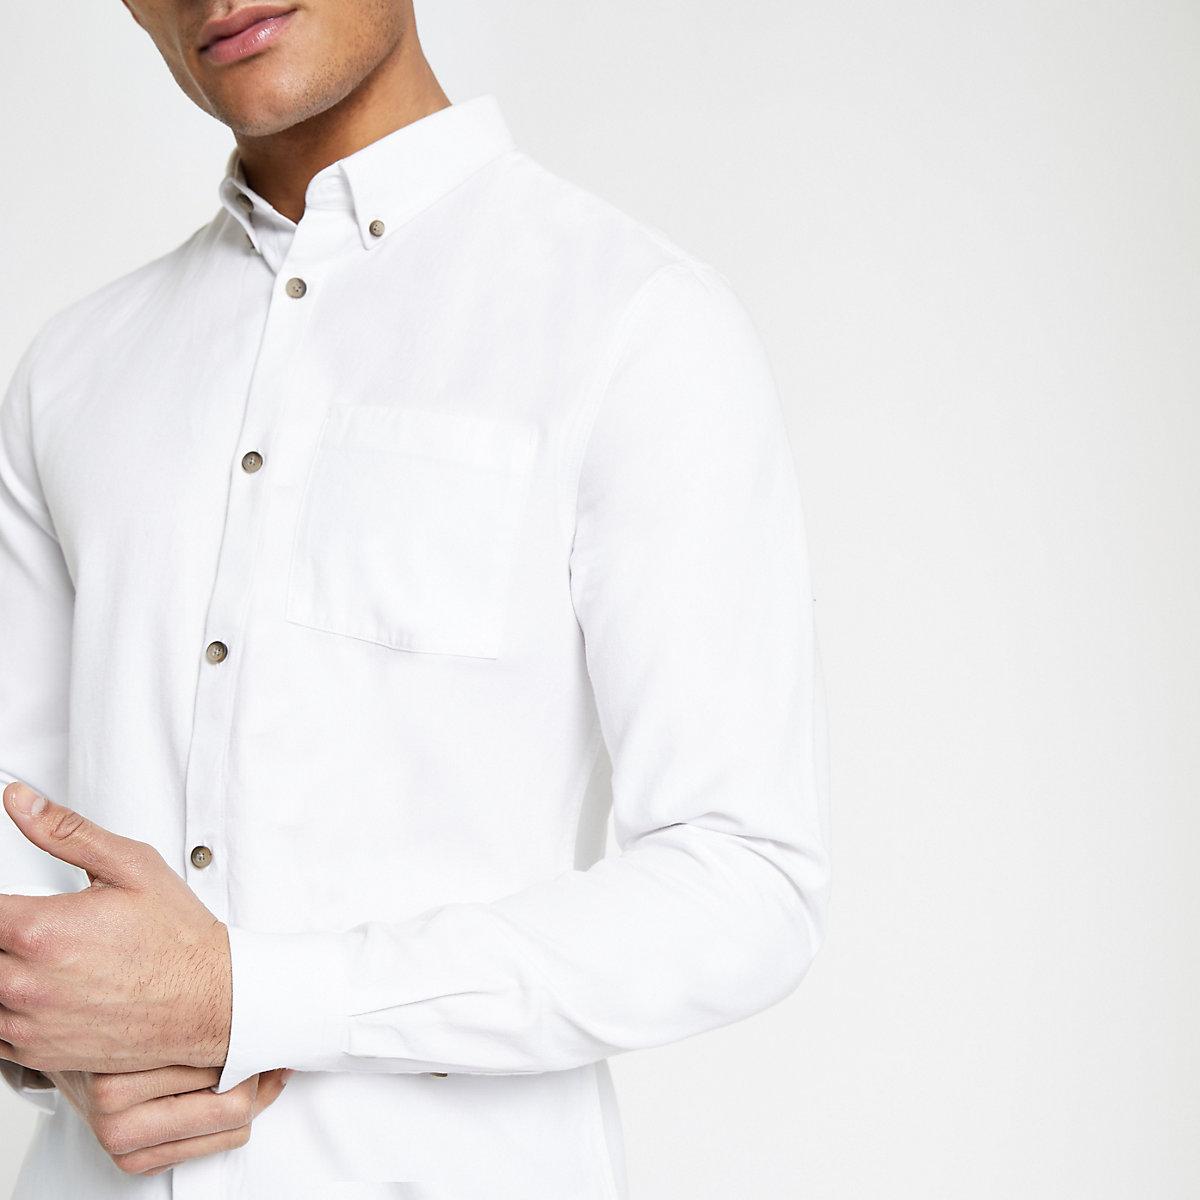 White lyocell chest pocket shirt